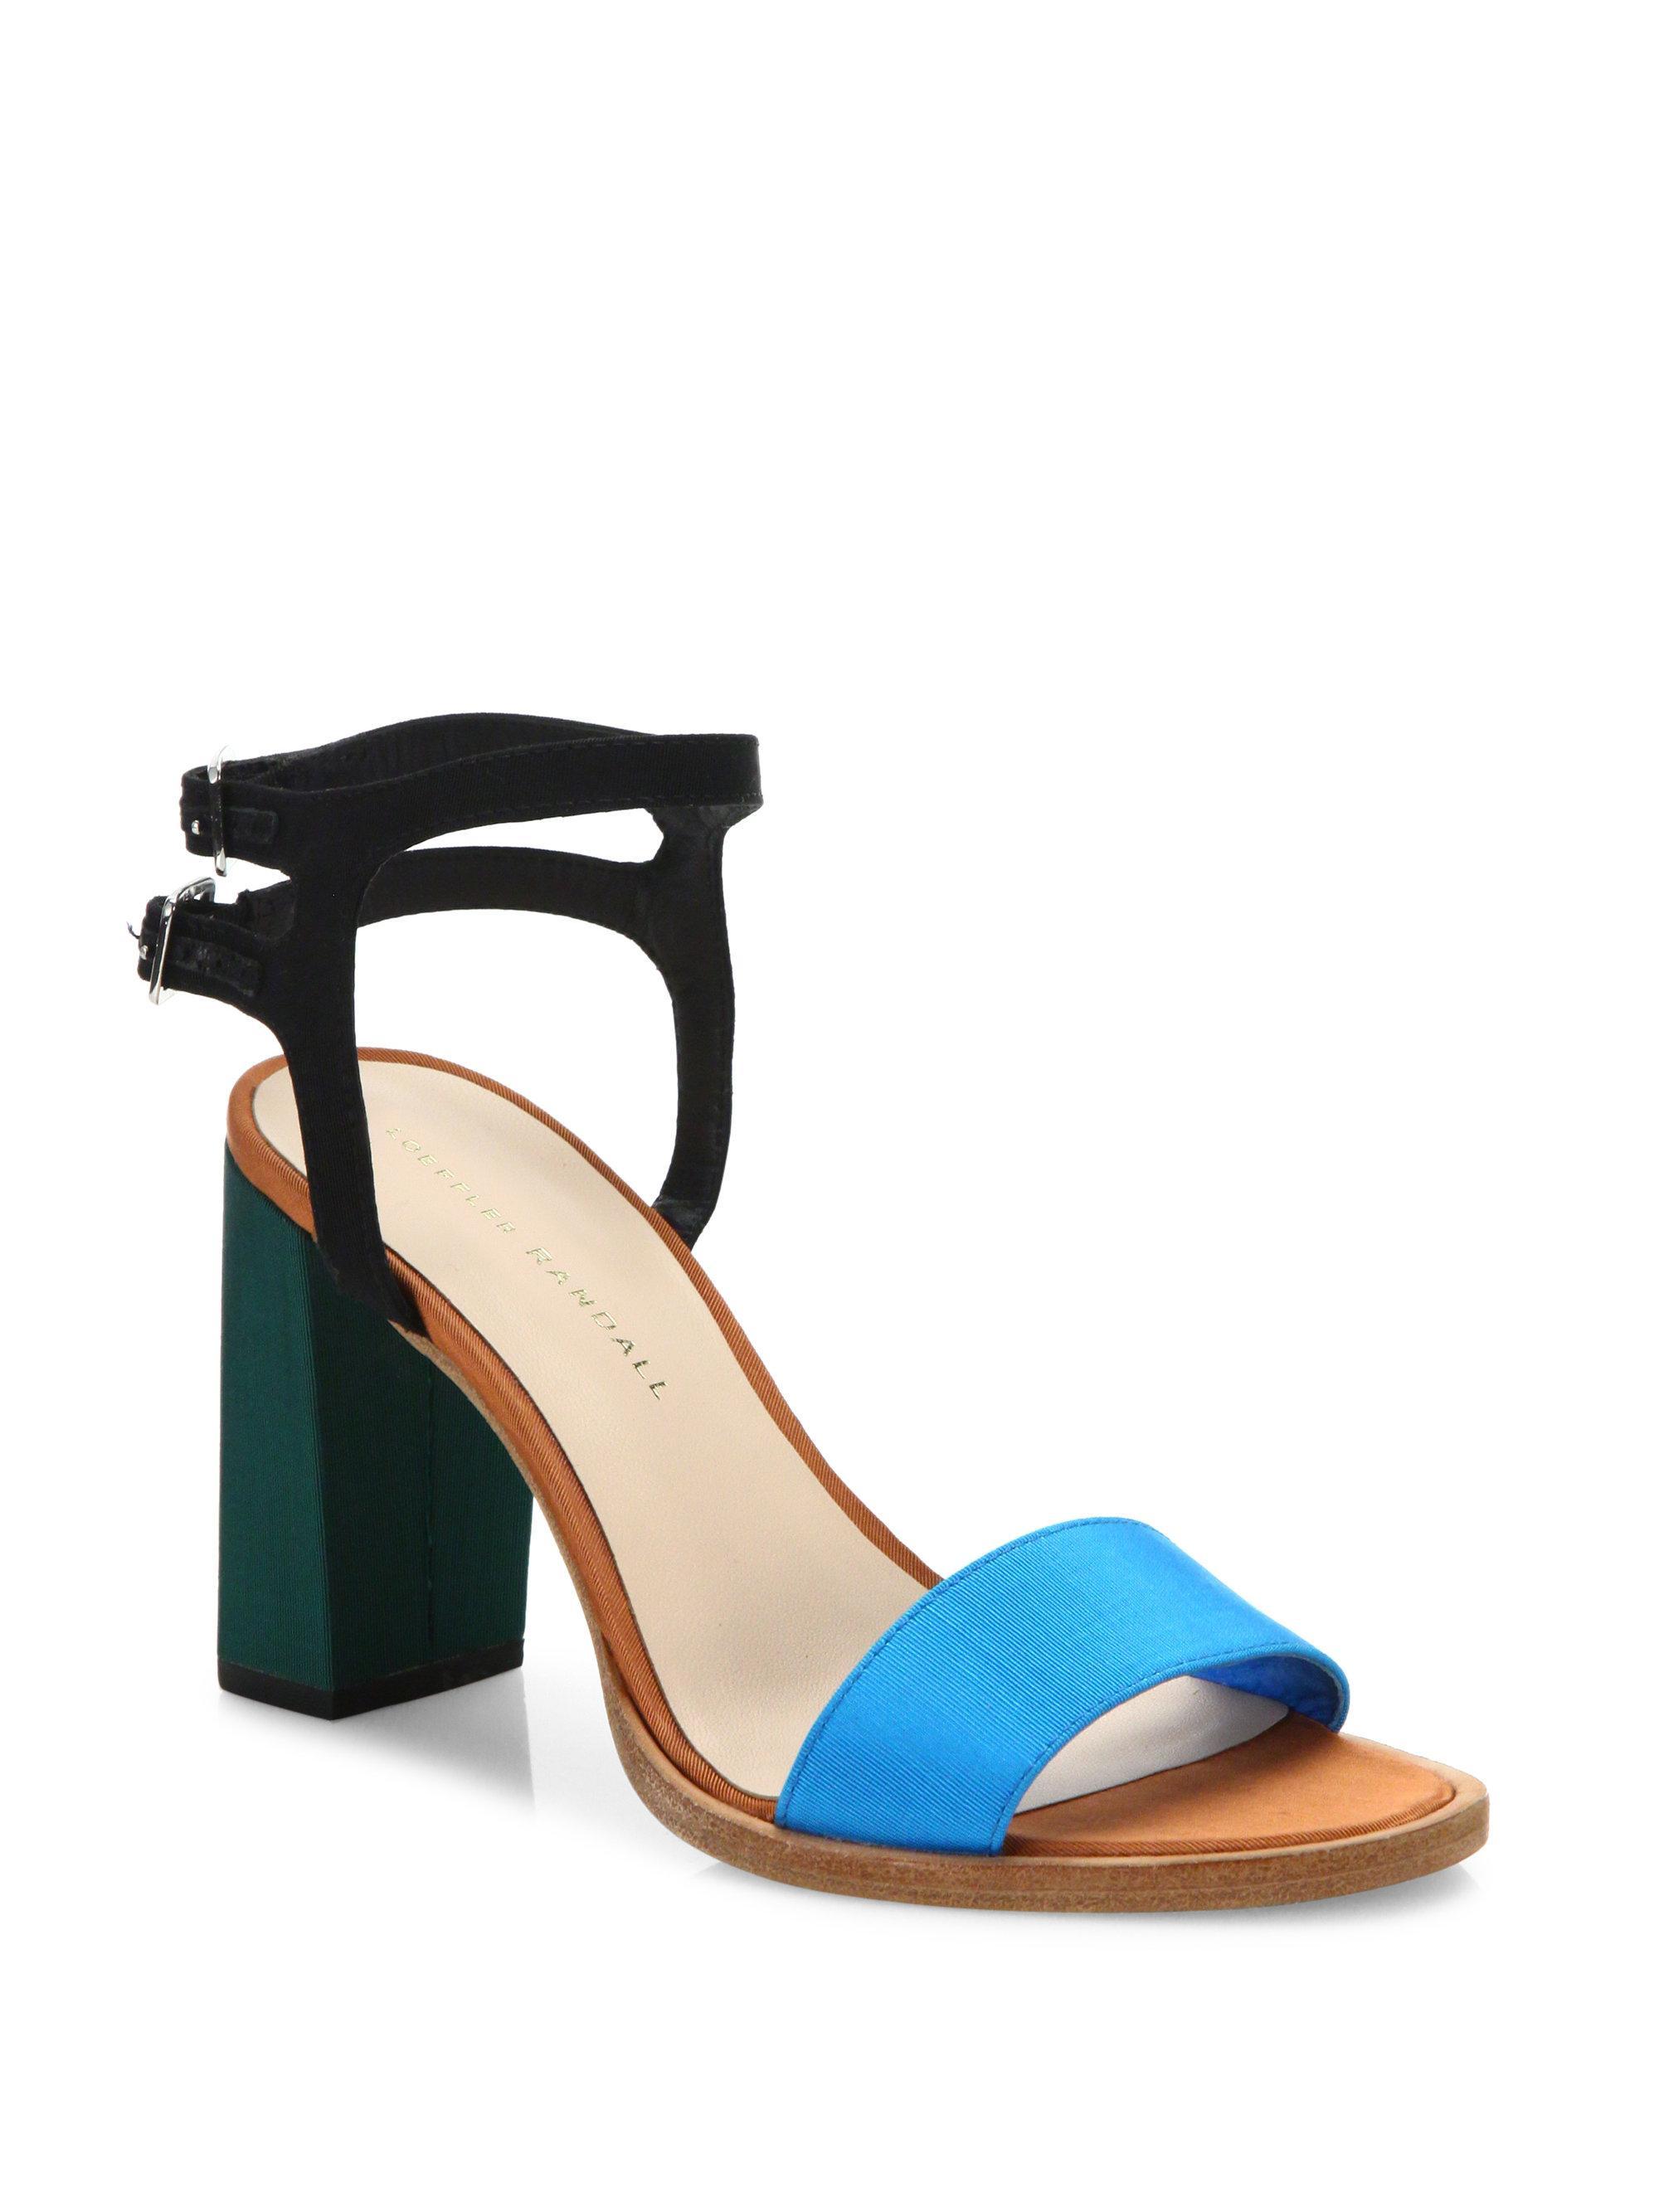 9c37203e6e3d Loeffler Randall Sylvia Colorblock Block Heel Sandals in Blue - Lyst